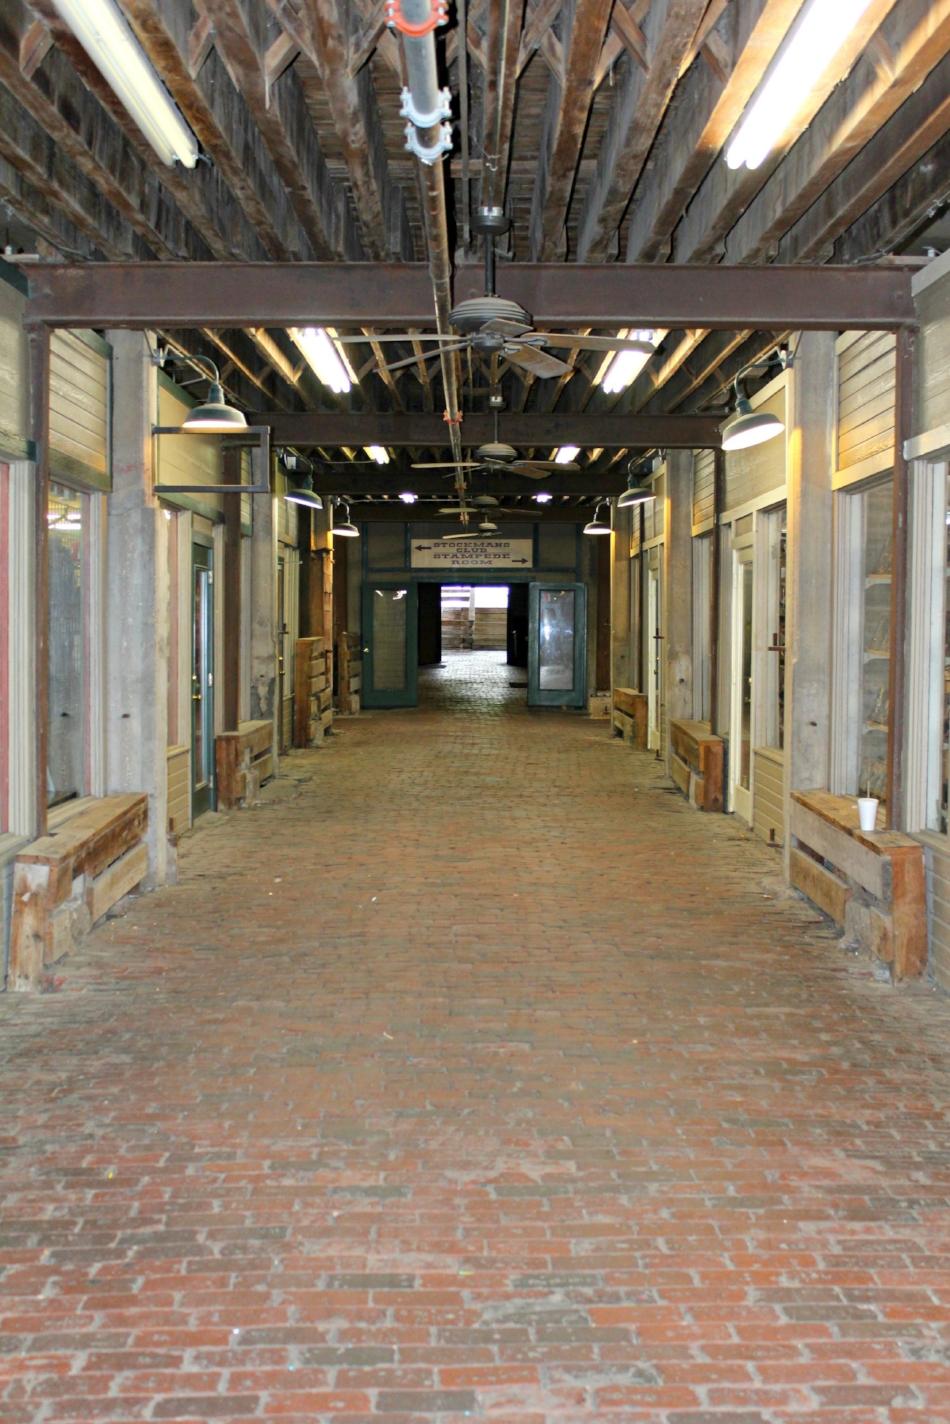 Fort Worth Stockyards 4.0.jpg